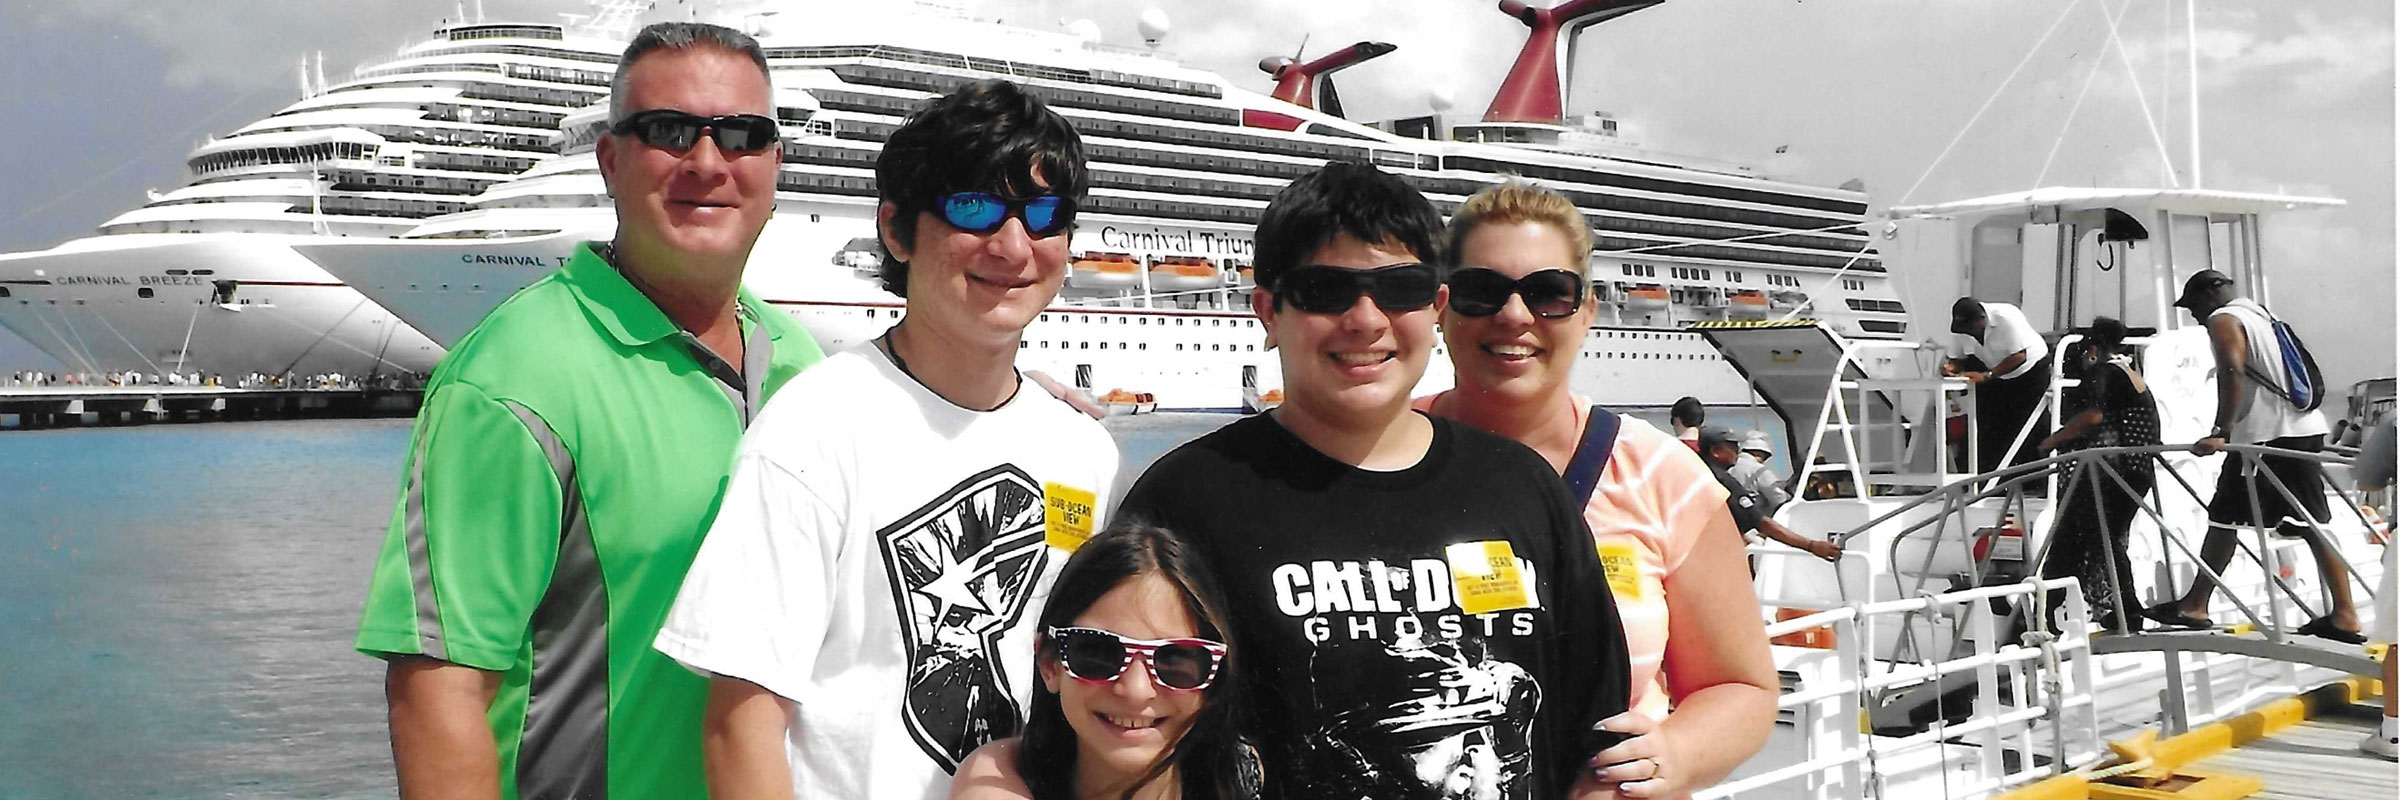 cruise-slide-02